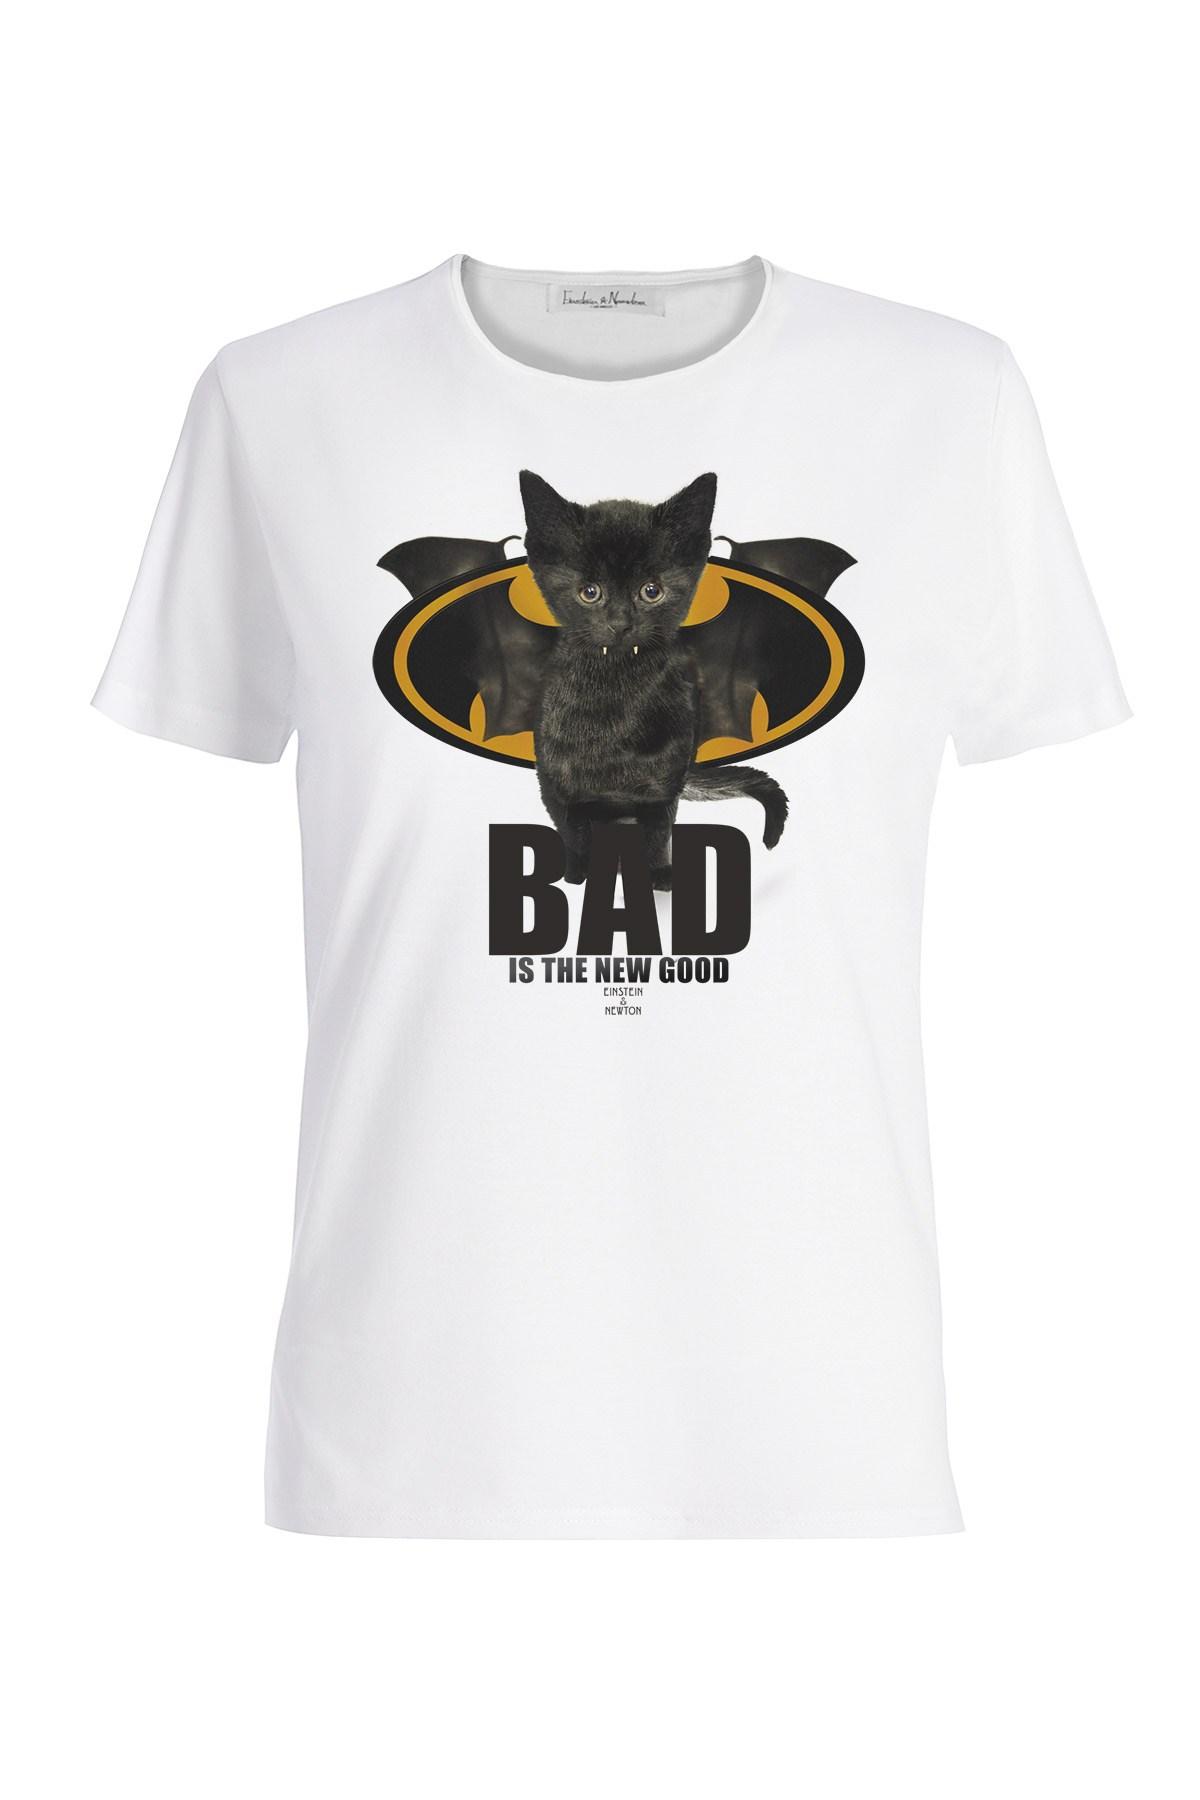 Bad Cat Shirt Rodeo